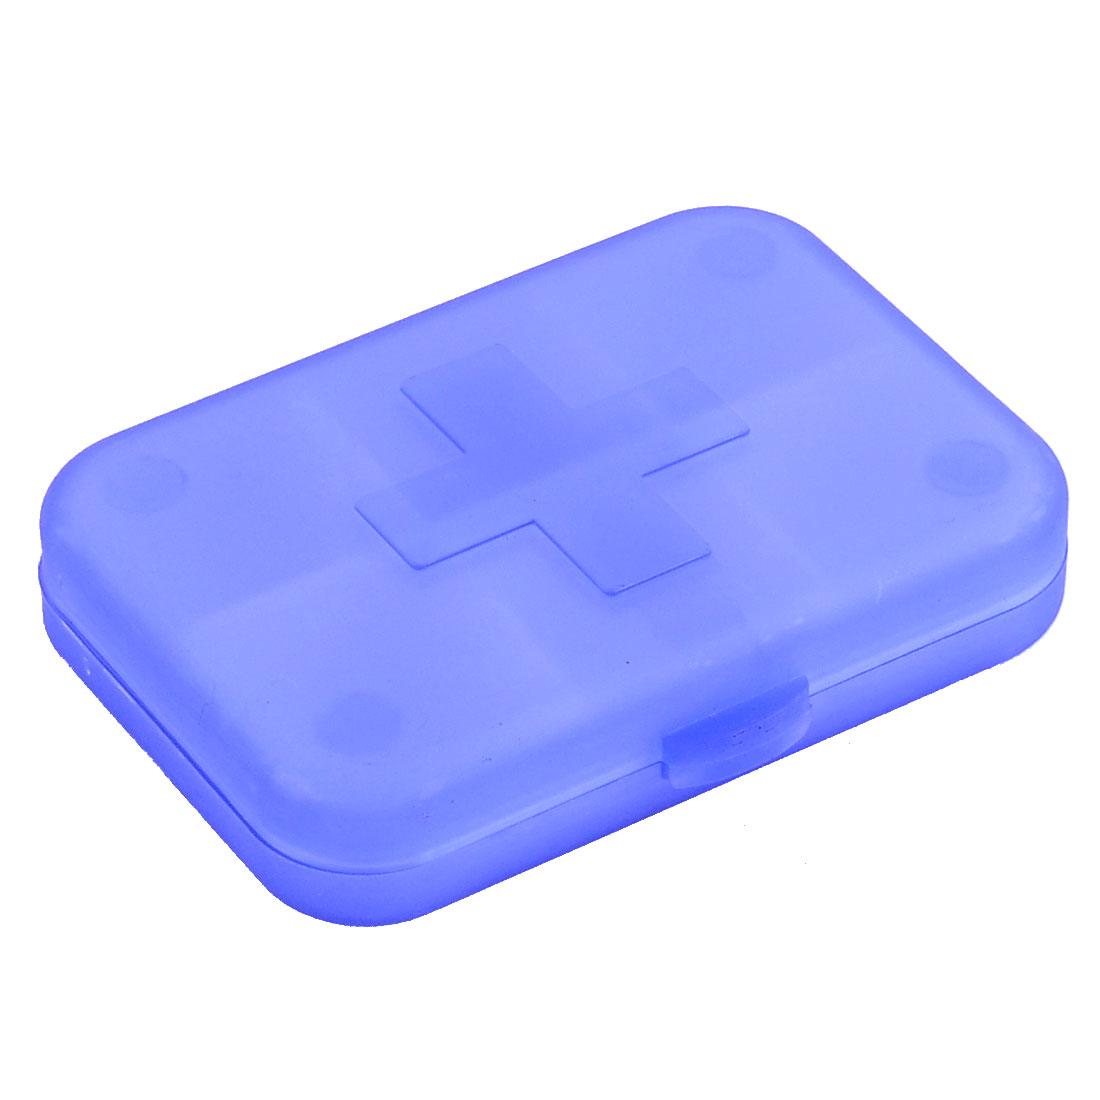 Plastic Rectangle Design Medicine Pill Container Storage Box Case Clear Blue